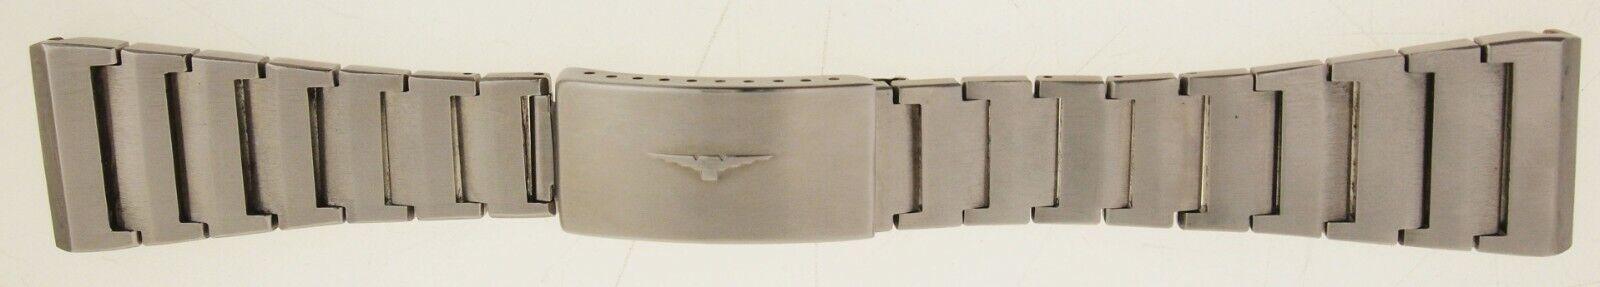 LONGINES EDELSTAHL ARMBAND - BANDANSTOSS 24 mm - MIT FALTSCHLIESSE - CHRONOGRAPH